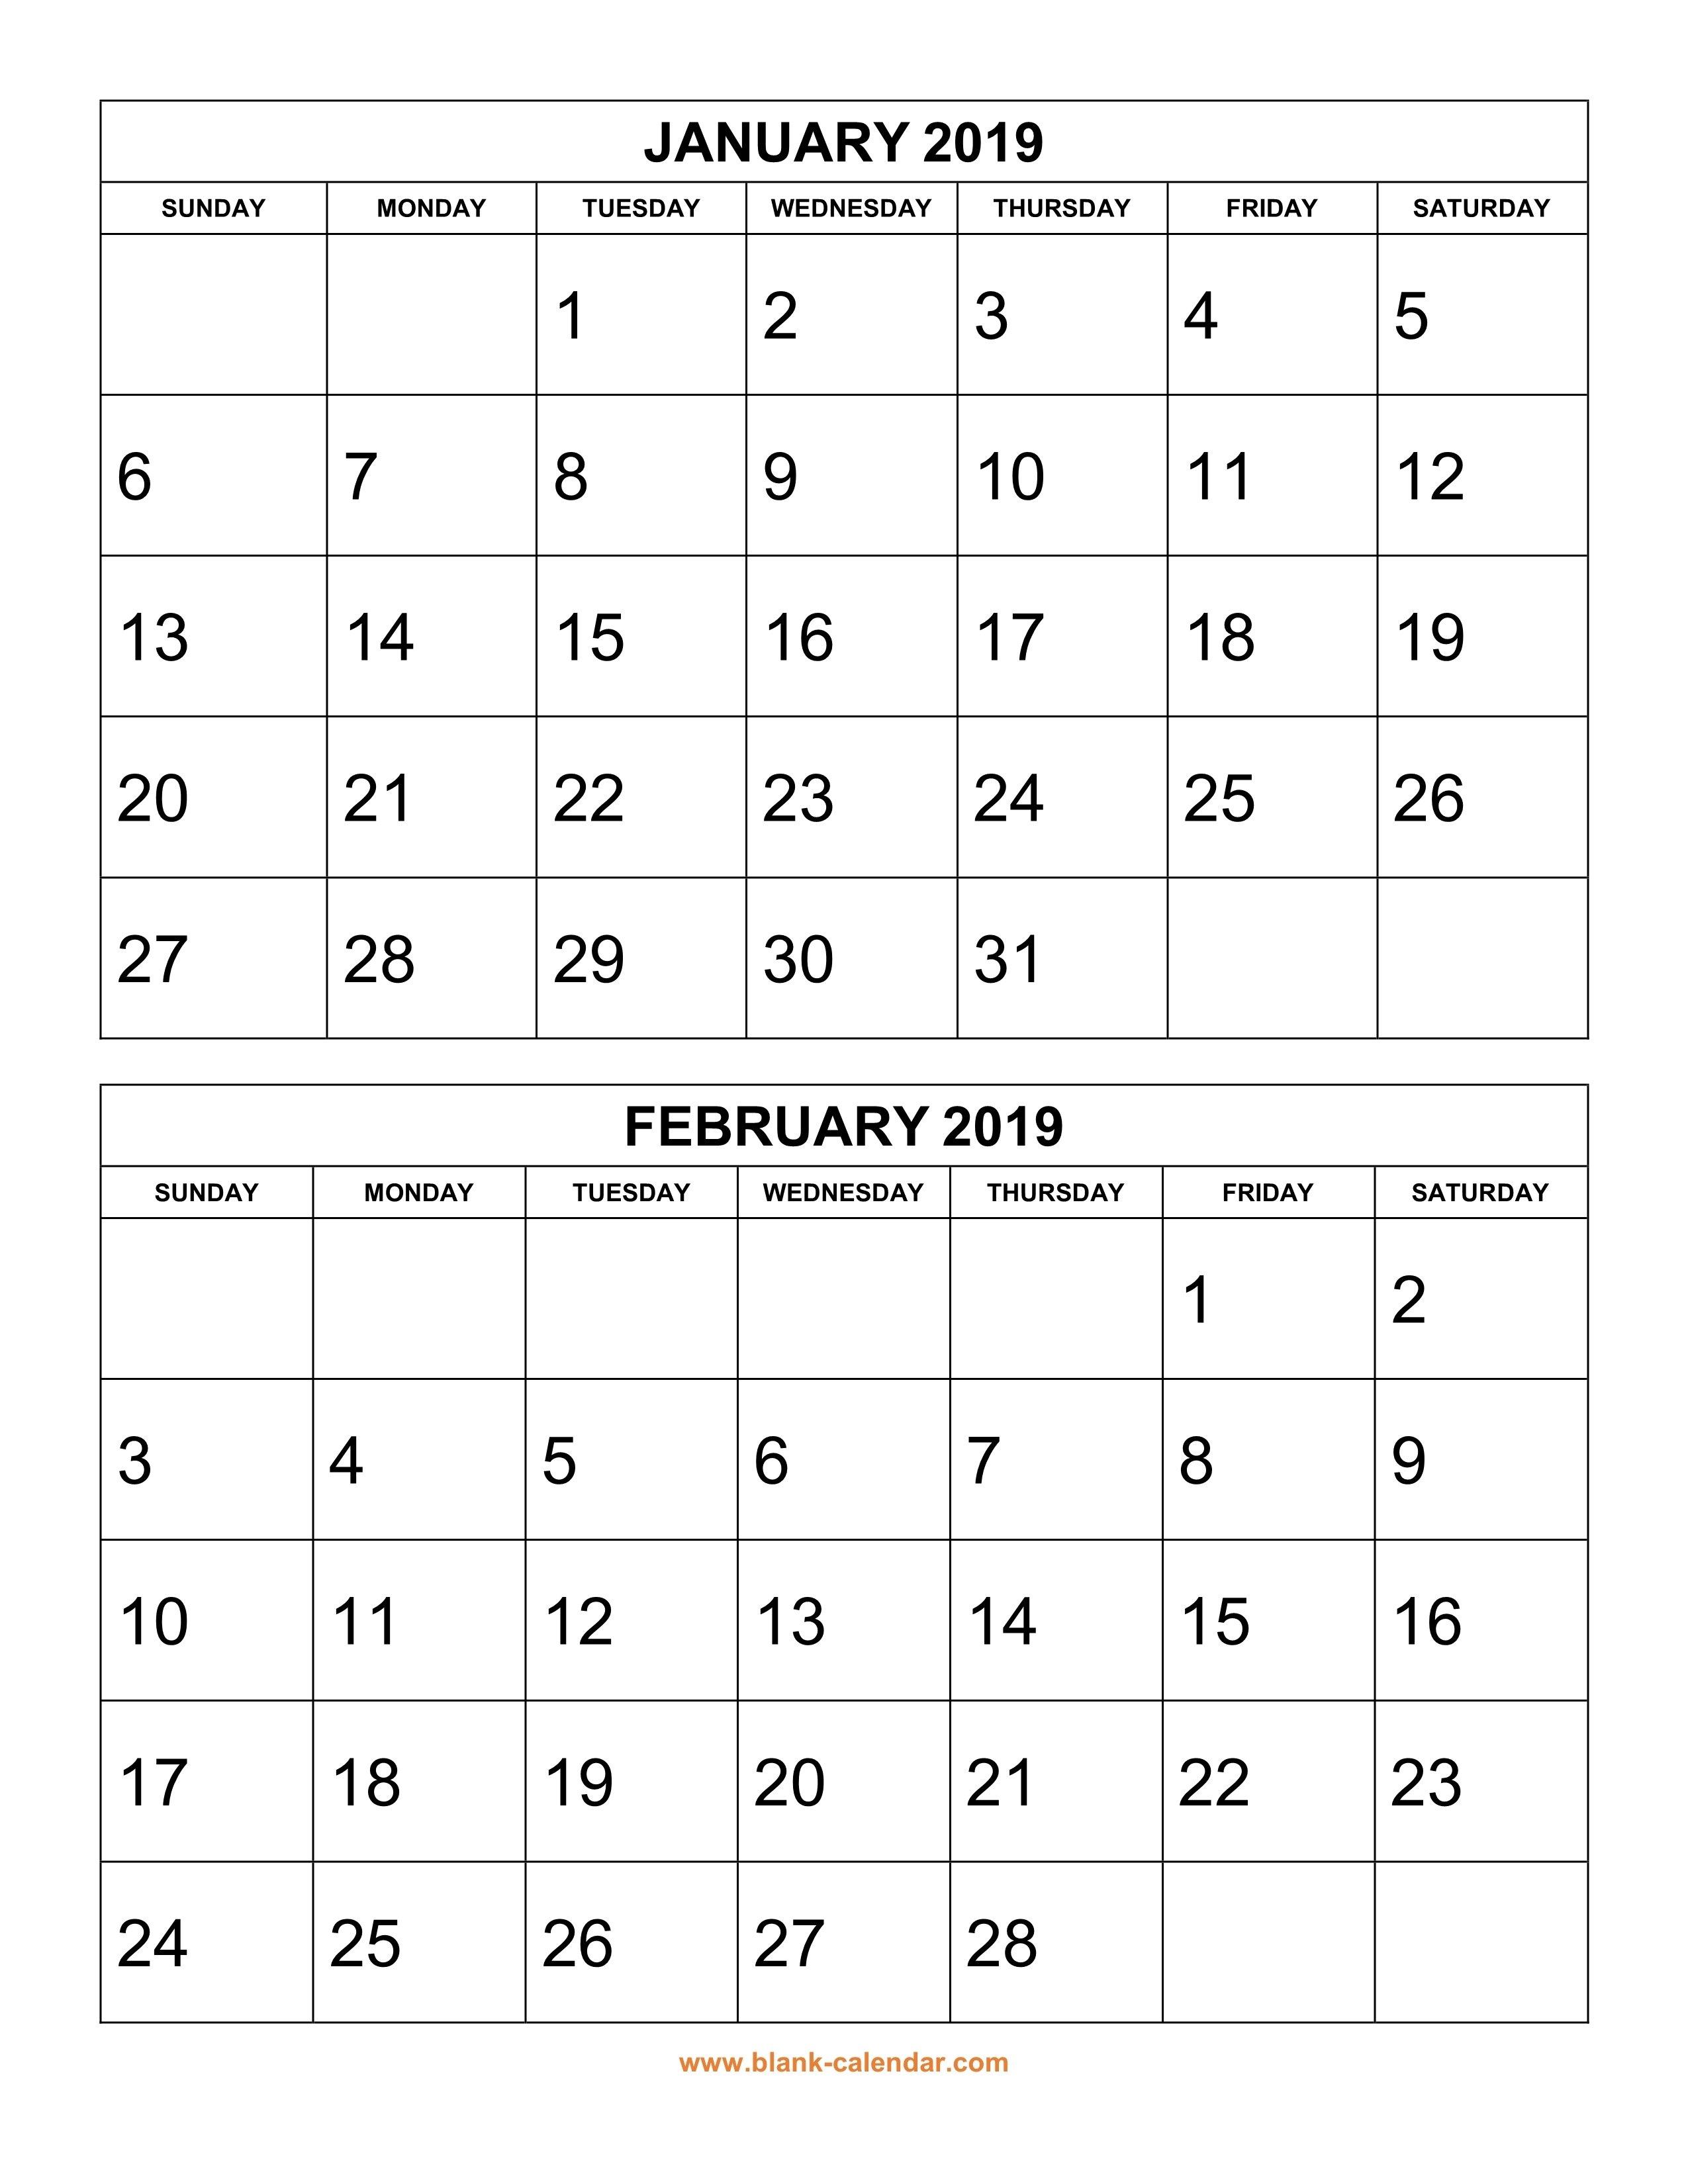 Free Calendar 2019 Near Me | Calendar Design Ideas Calendar 2019 Near Me